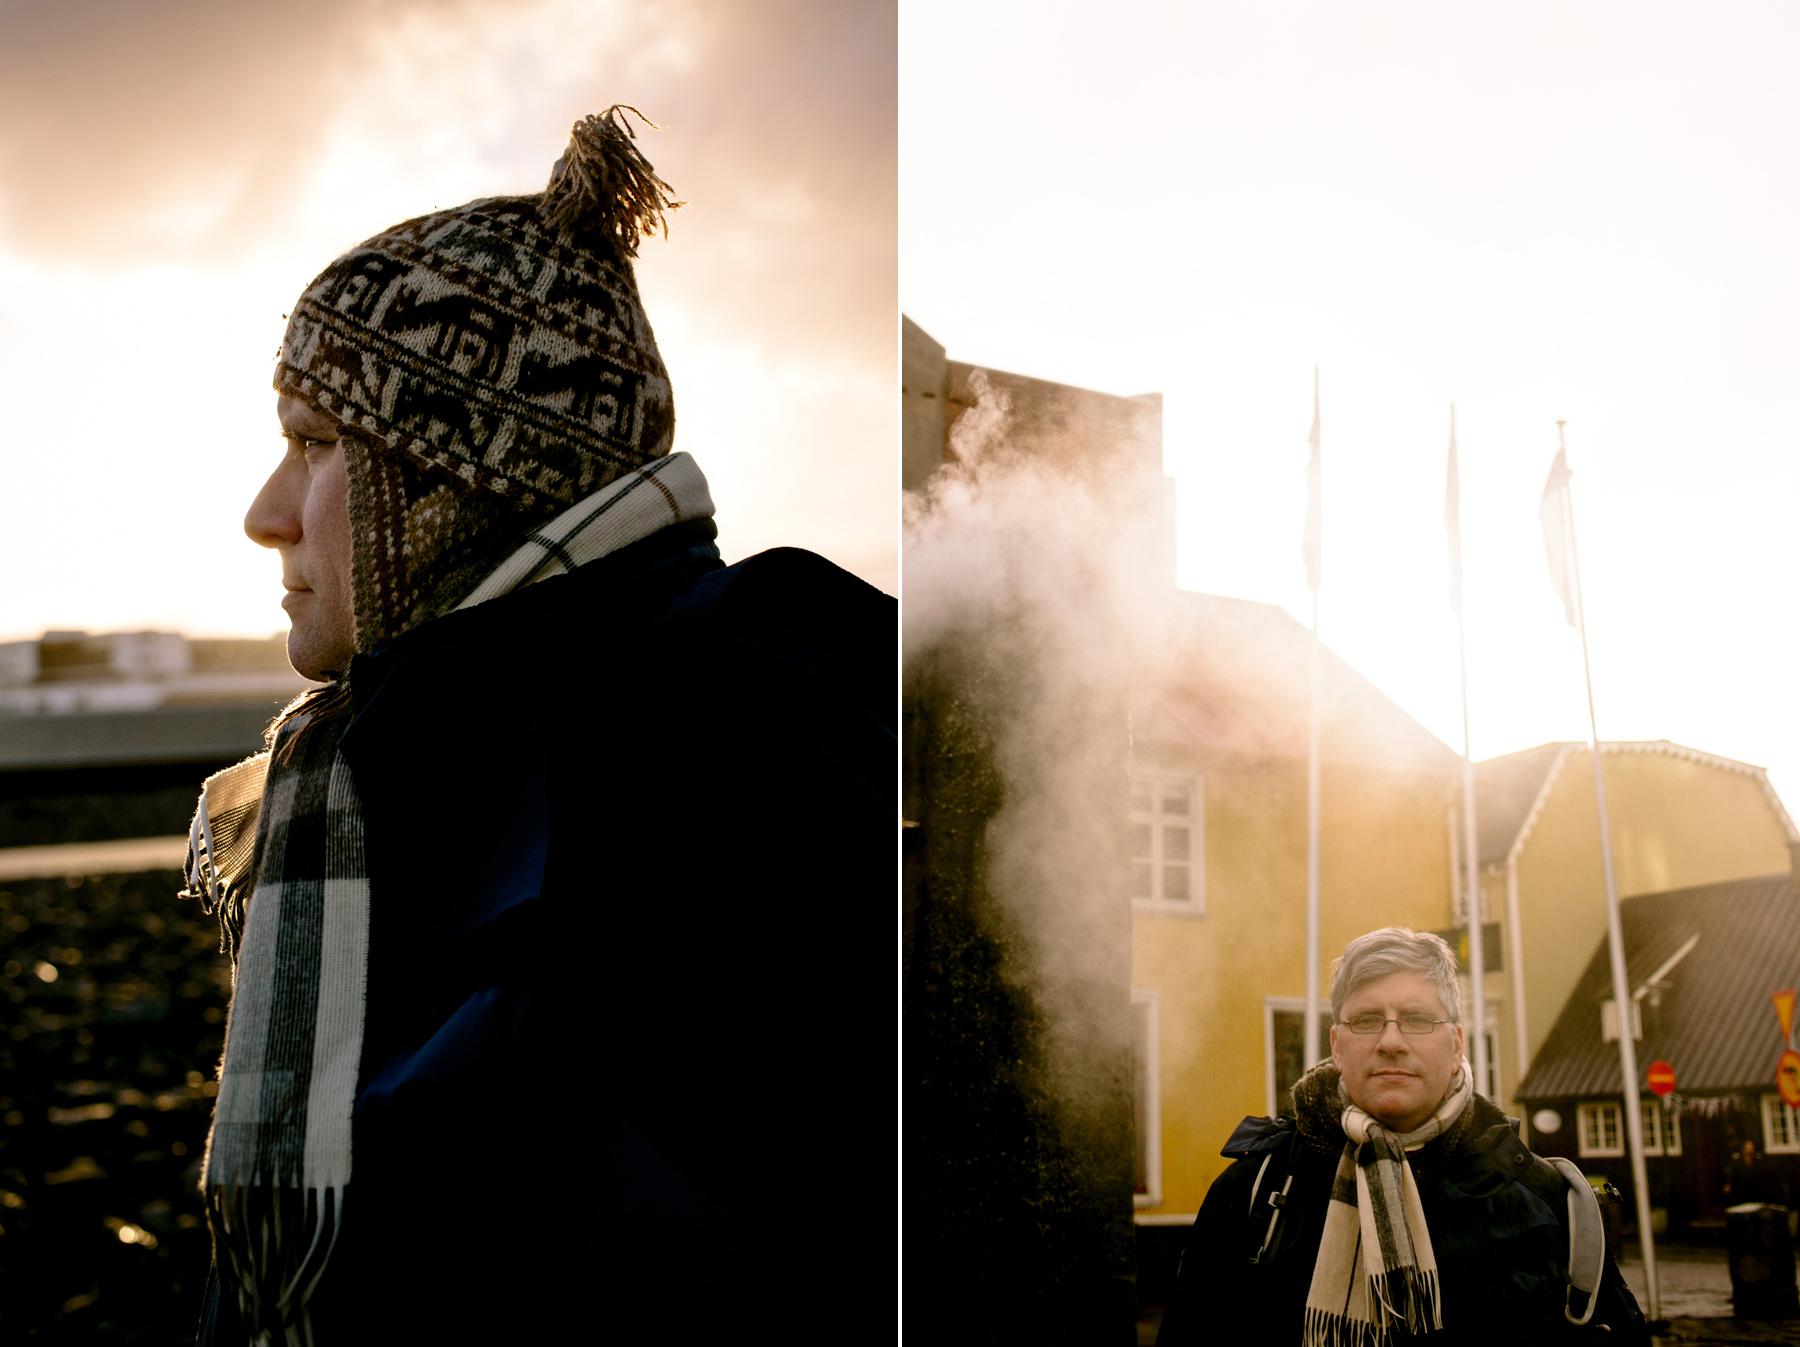 011-epic-iceland-photographer-portraits-kandisebrown-2016